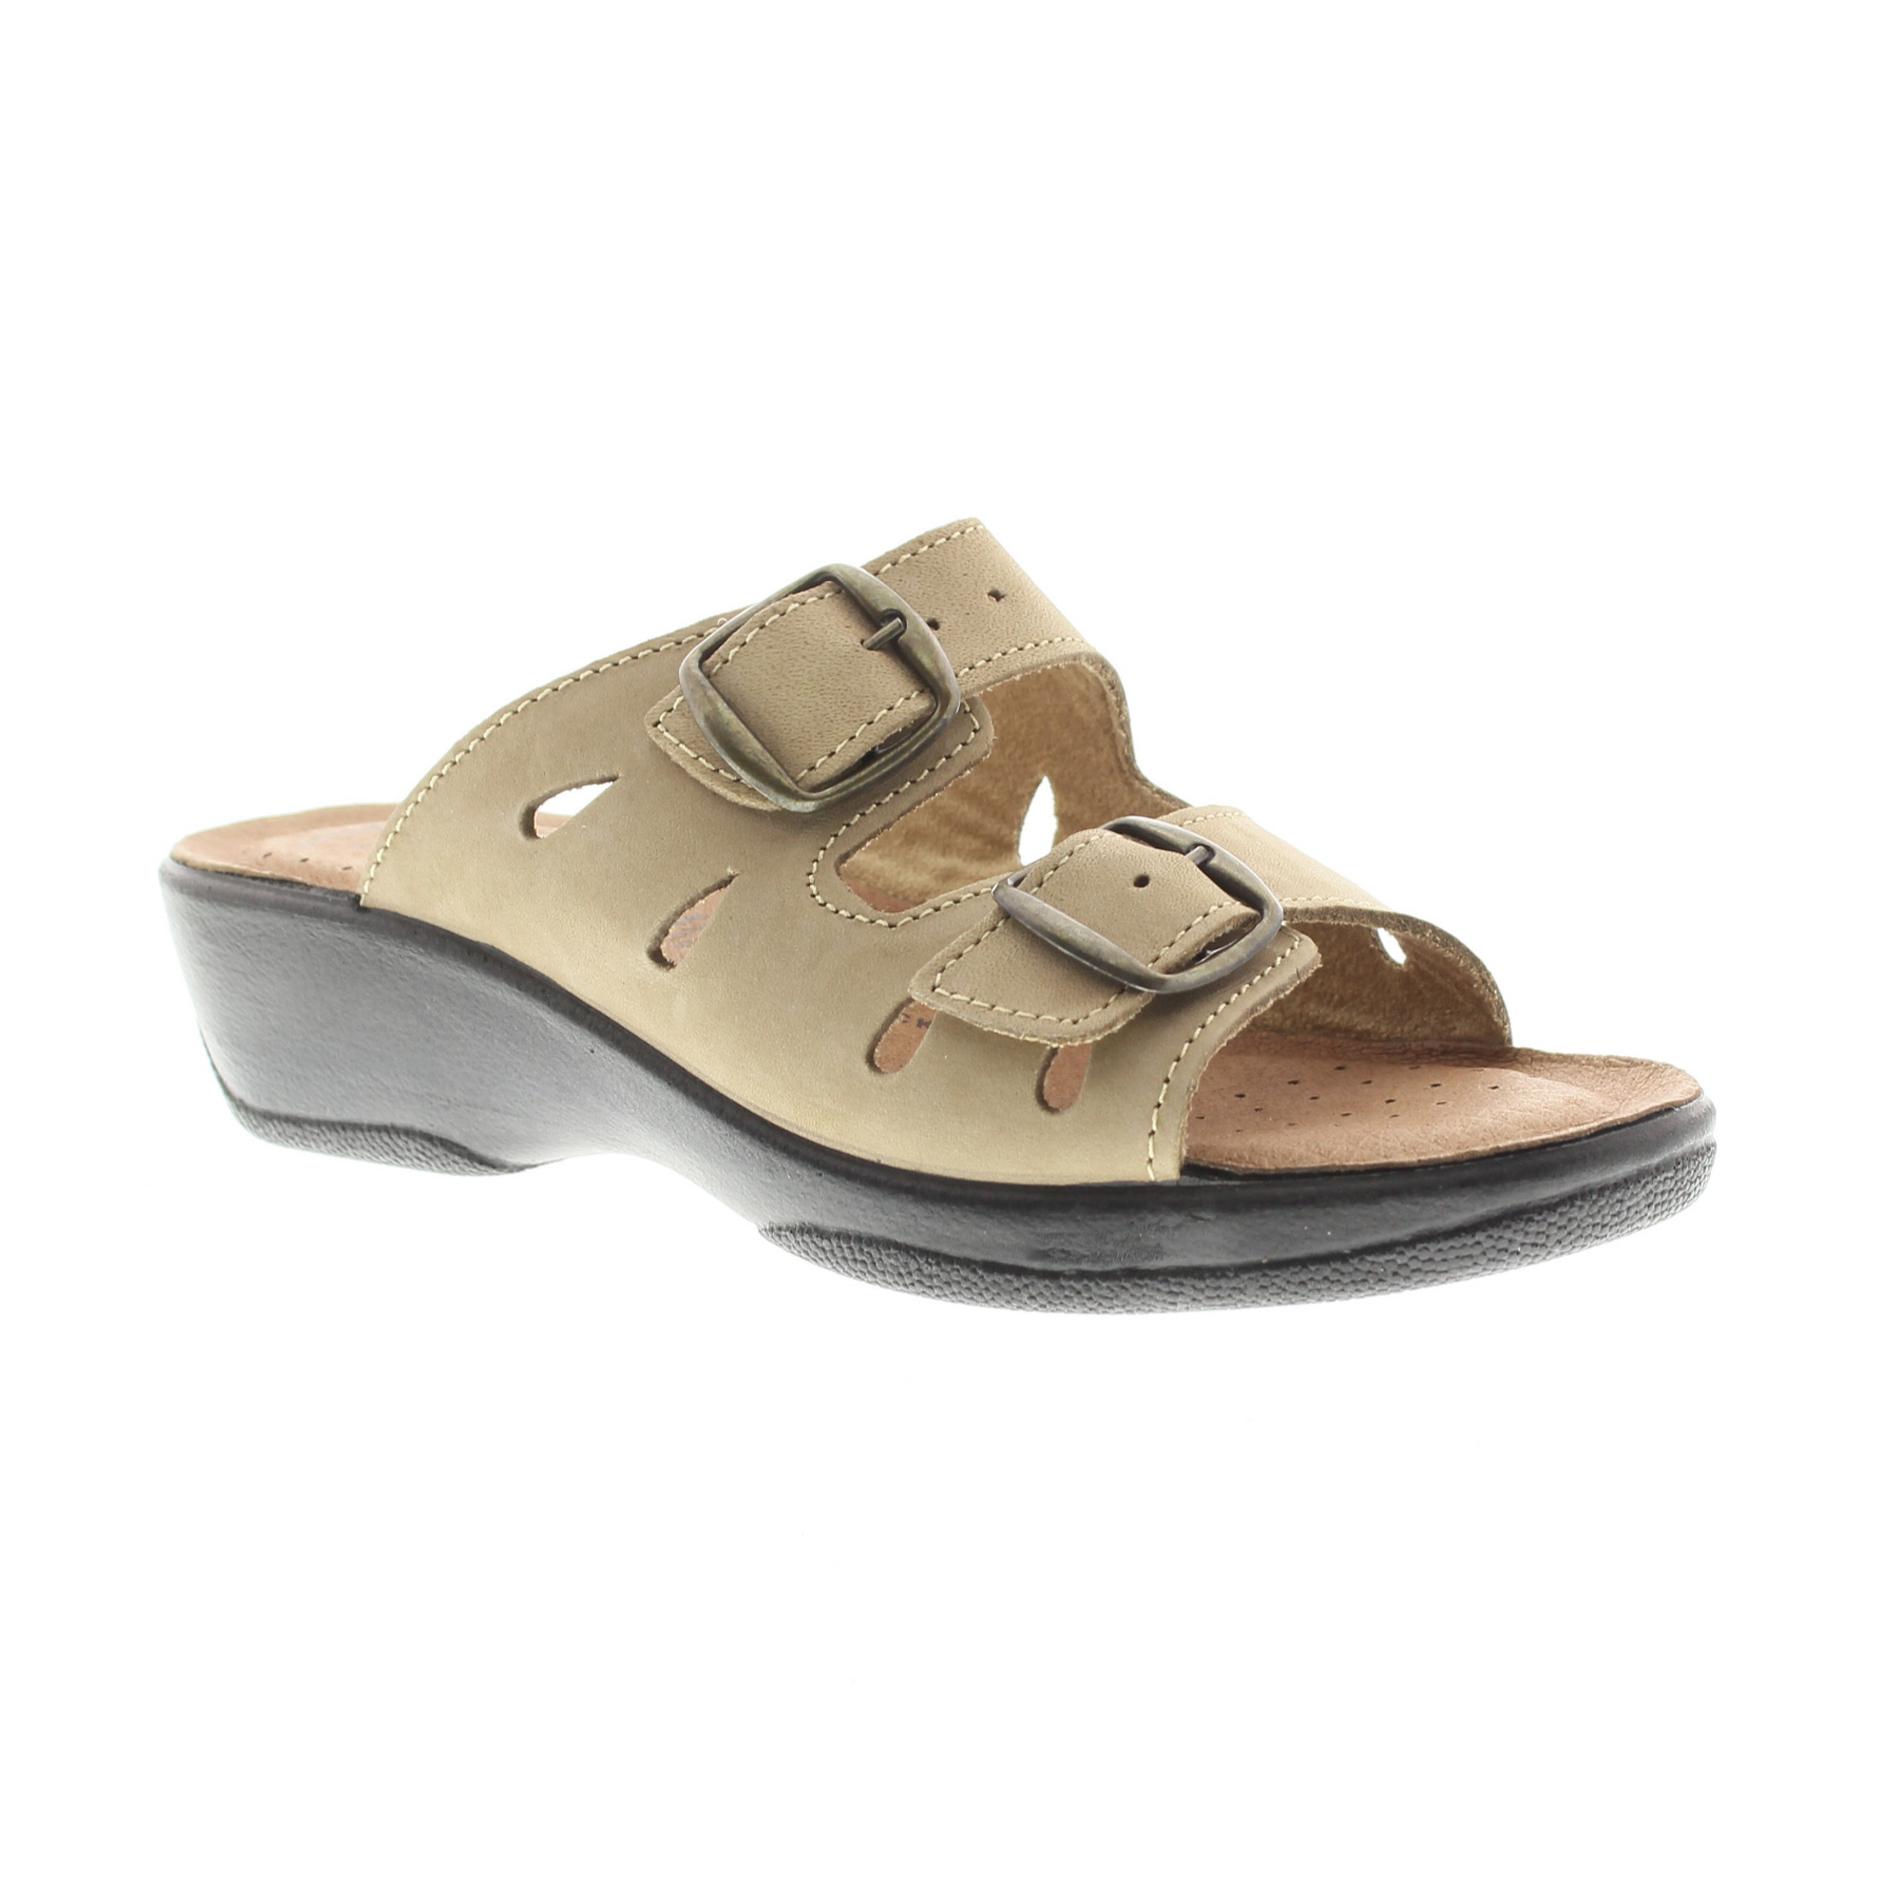 Flexus Decca Beige Slide Sandal by Spring Step